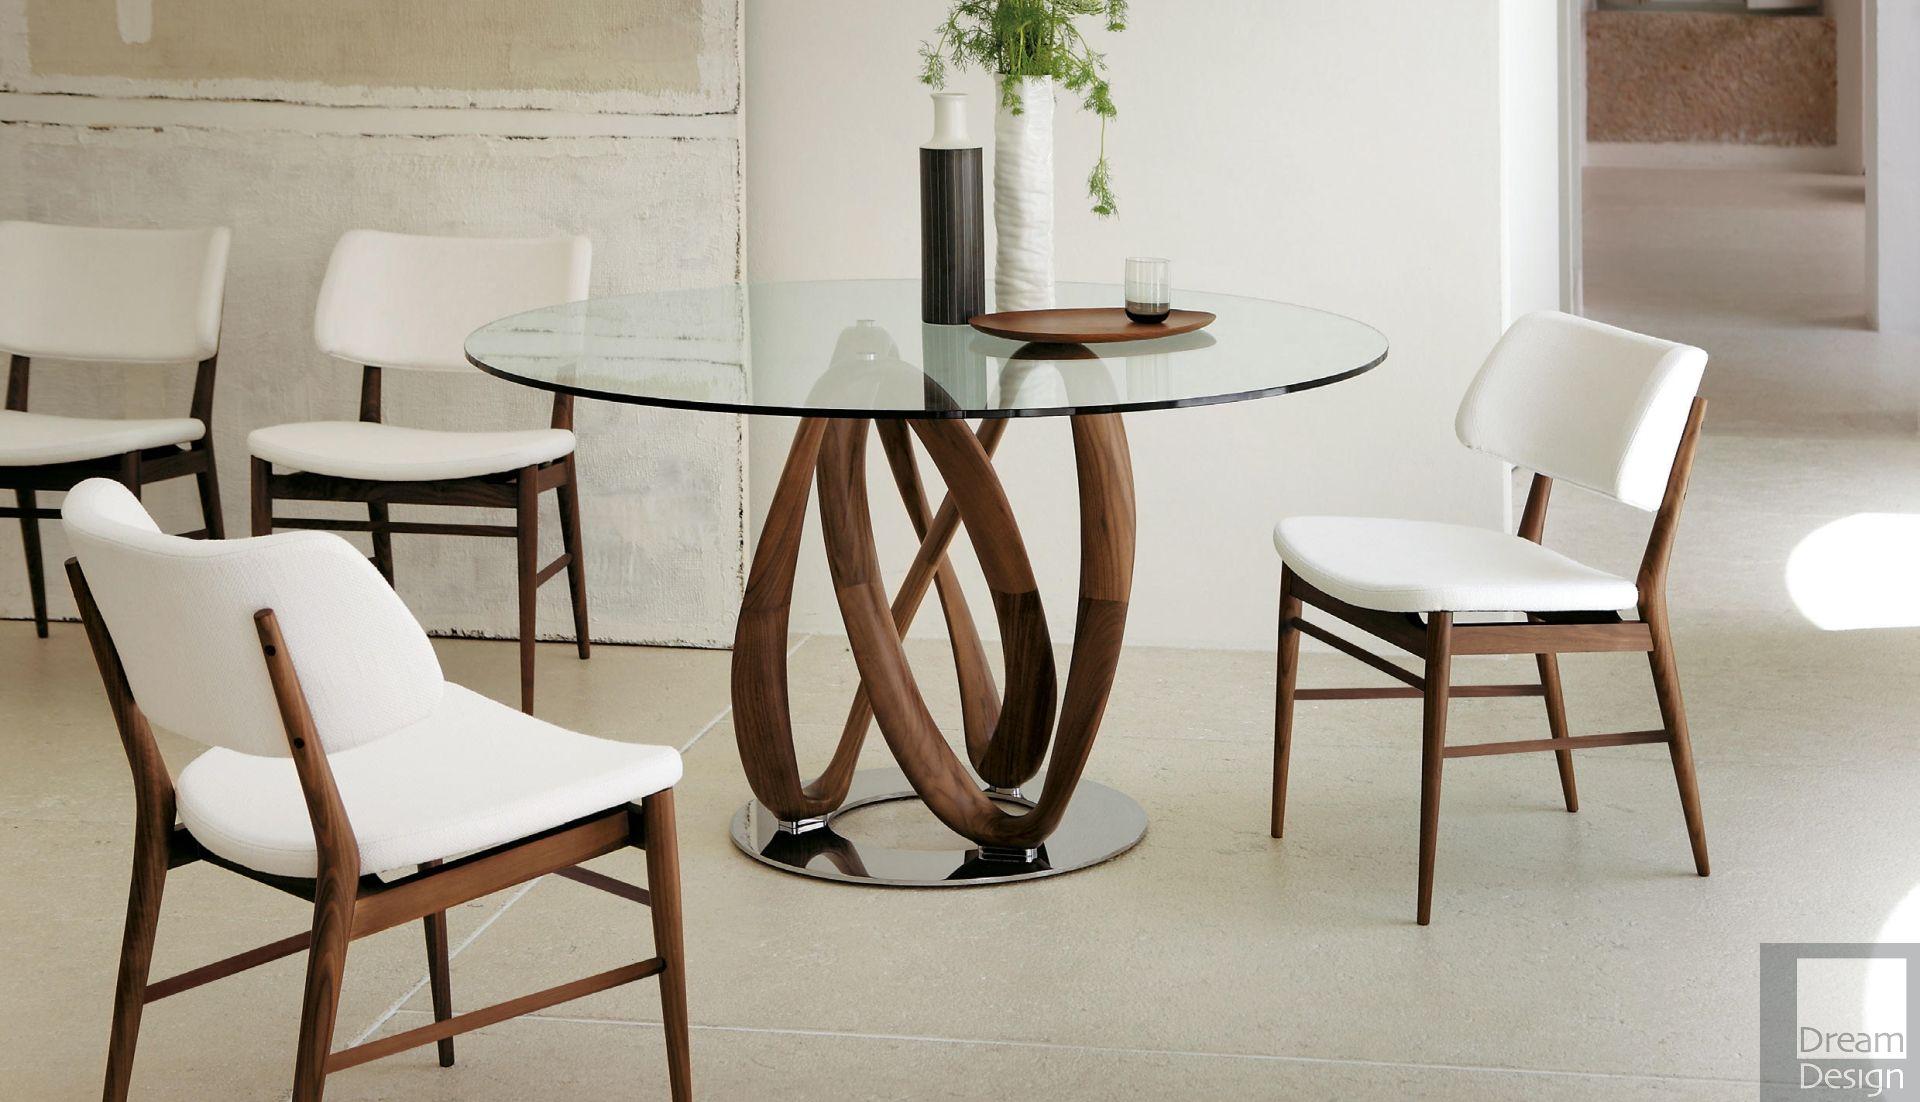 Porada Infinity Round Dining Table by S Bigi Everything But